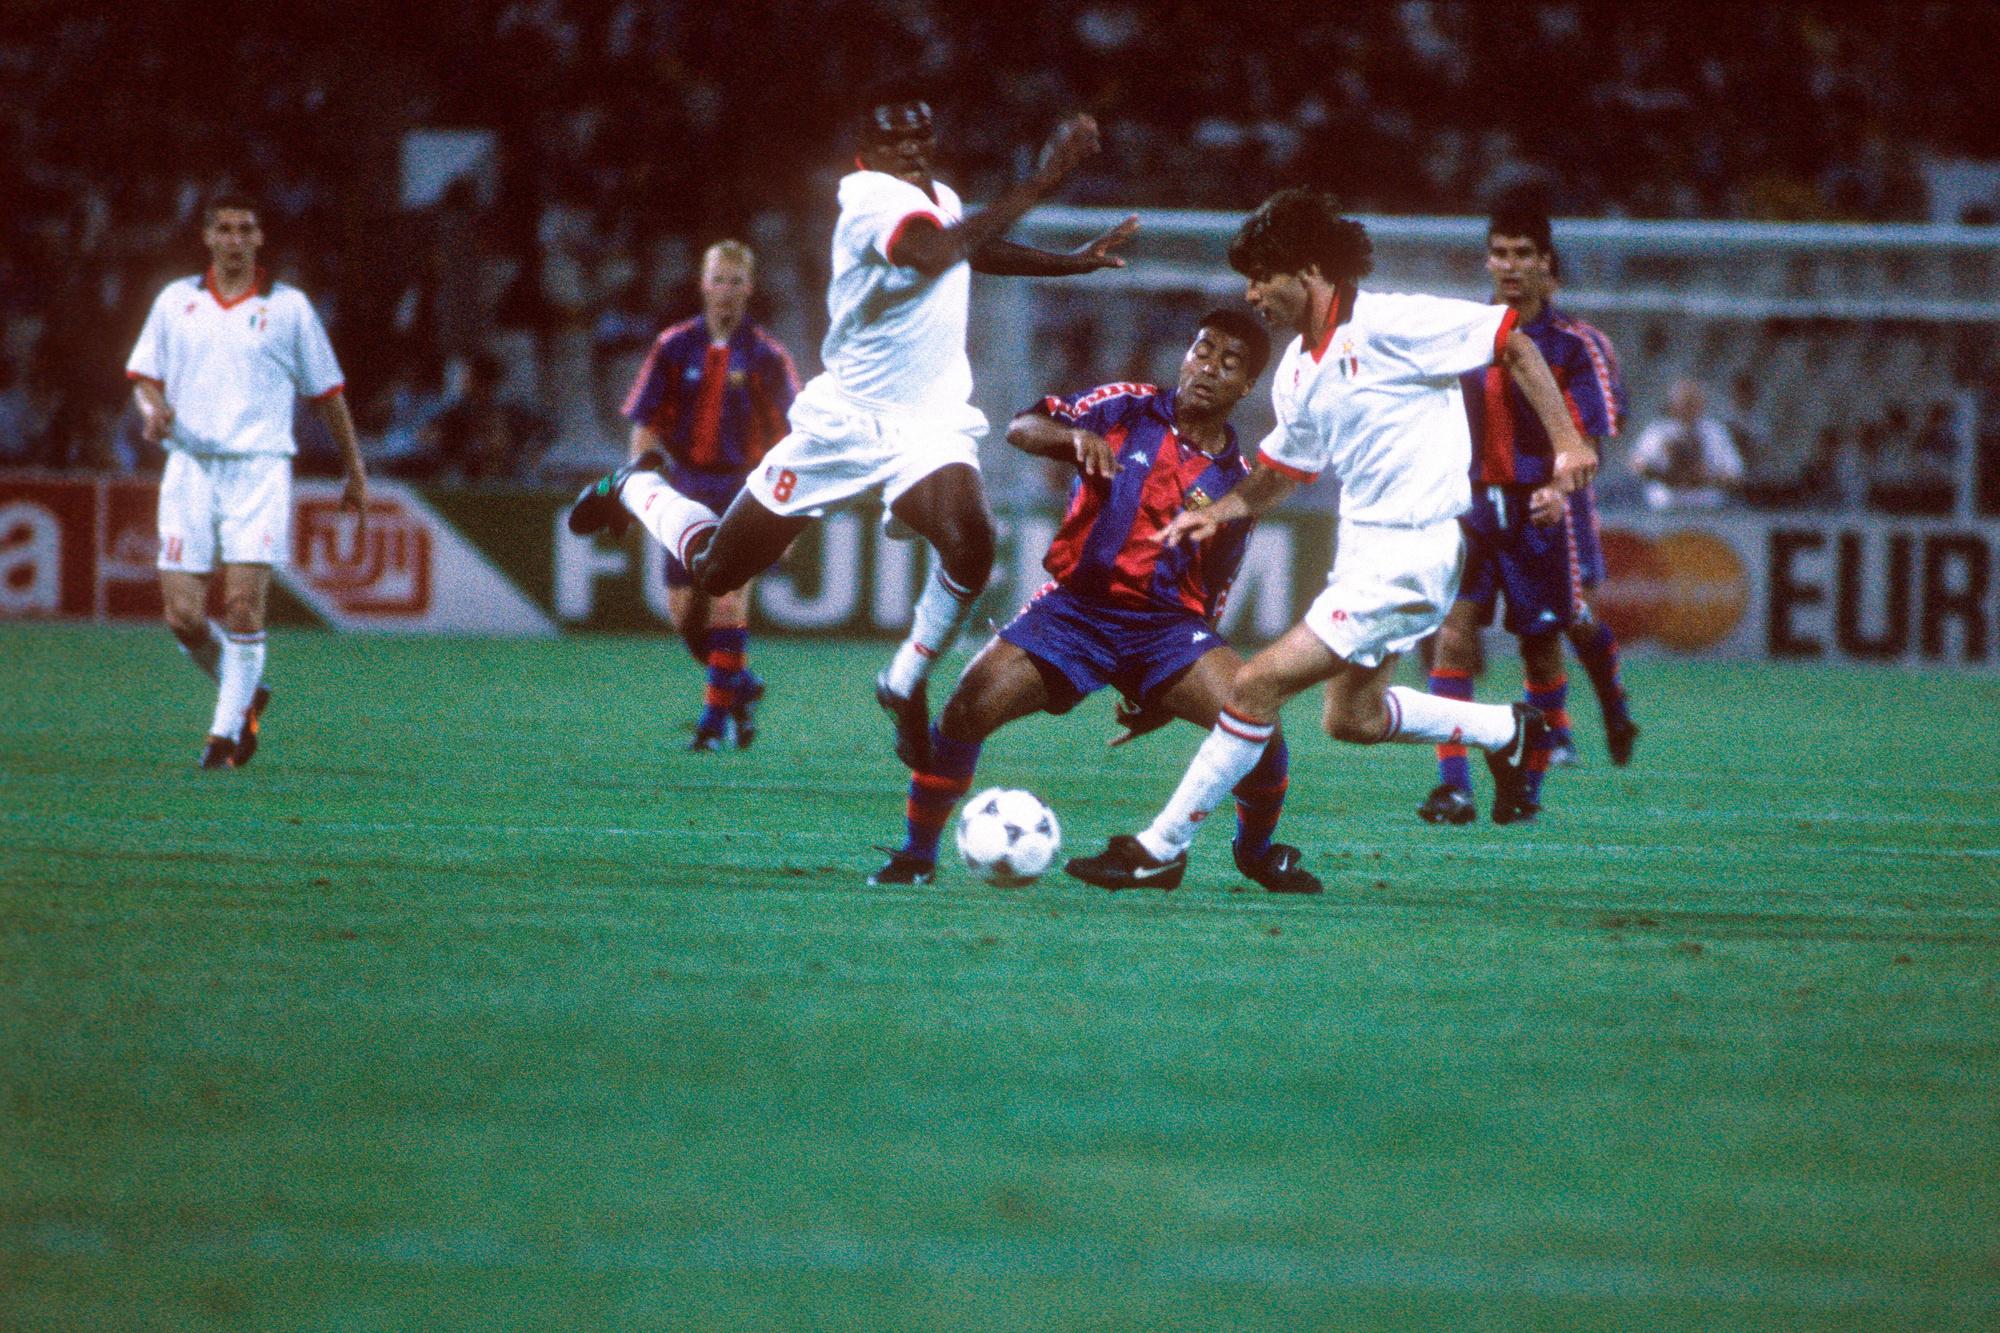 En finale, Romario n'a rien pu faire face aux Milanais., belga